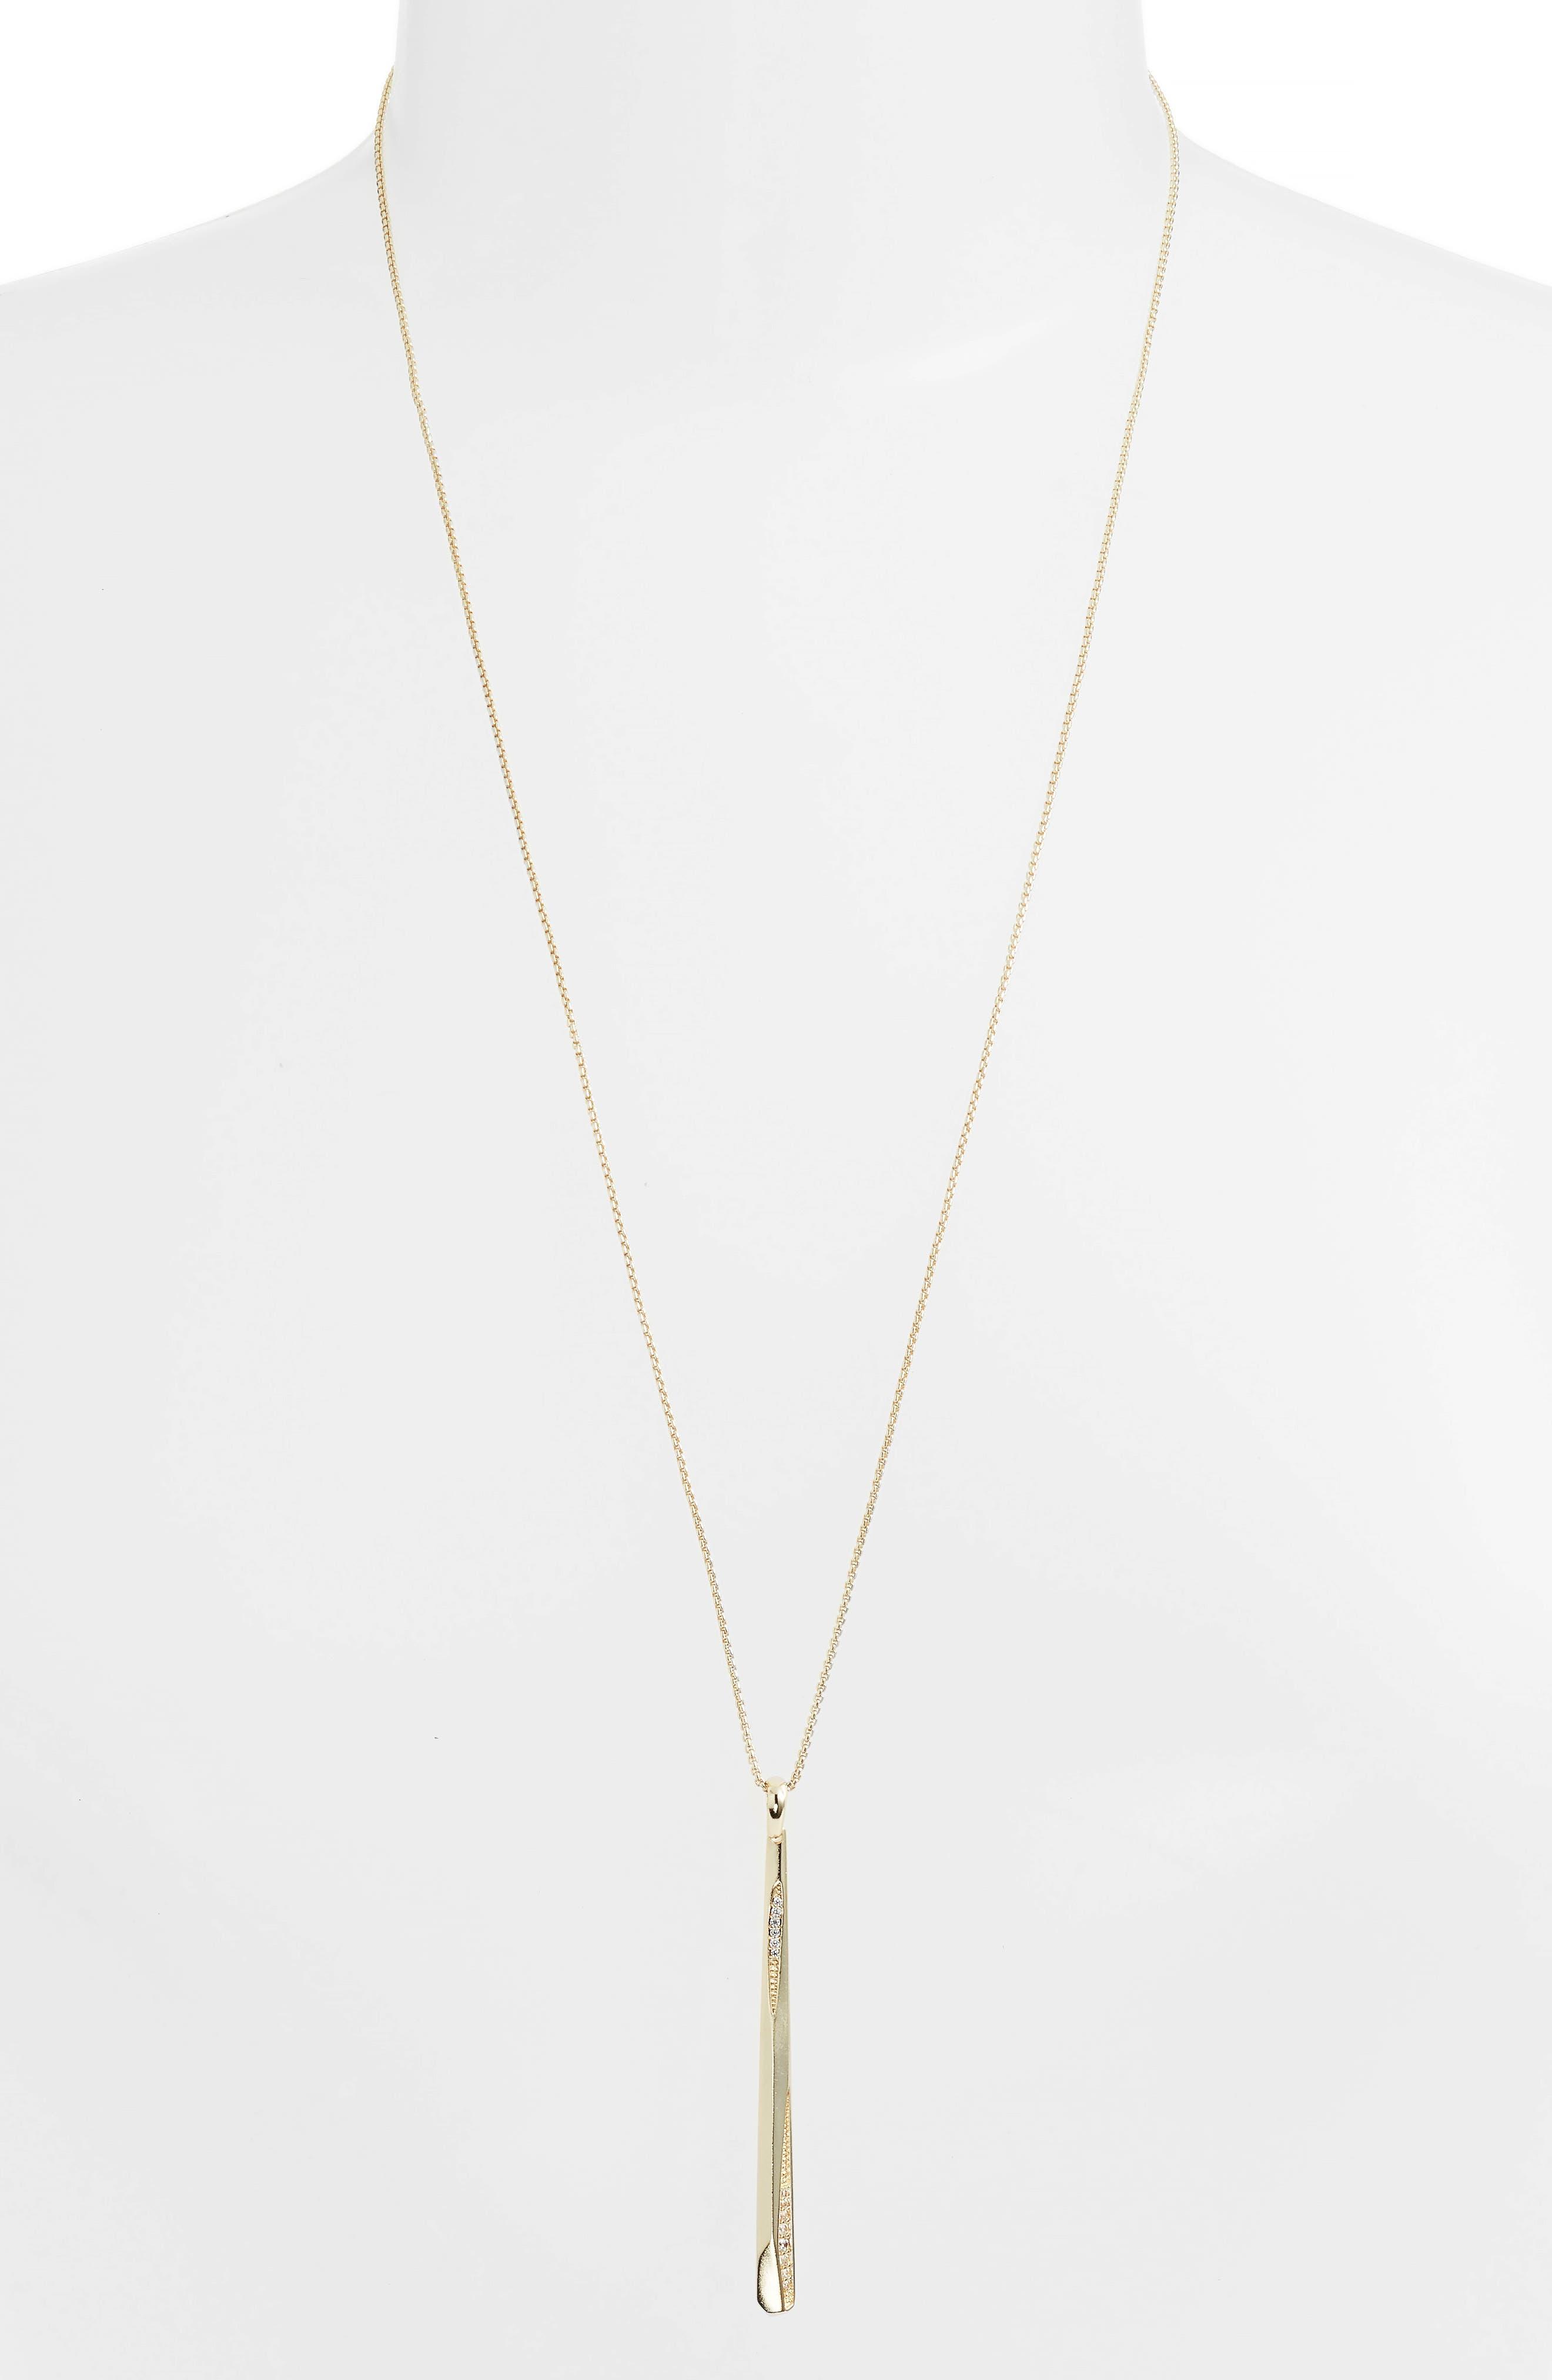 Ro Adjustable Necklace,                             Alternate thumbnail 2, color,                             White Cz/ Gold